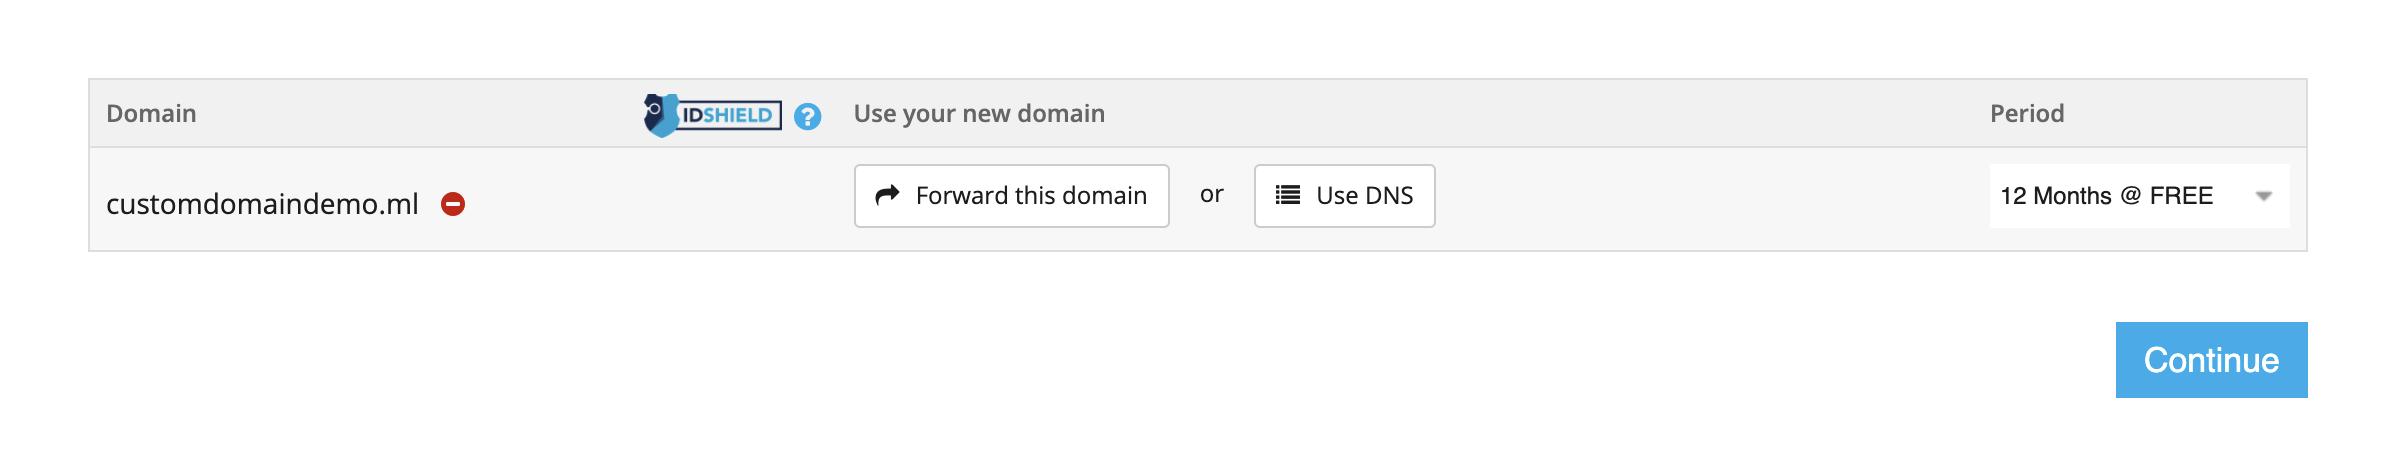 Freenom Domain Period